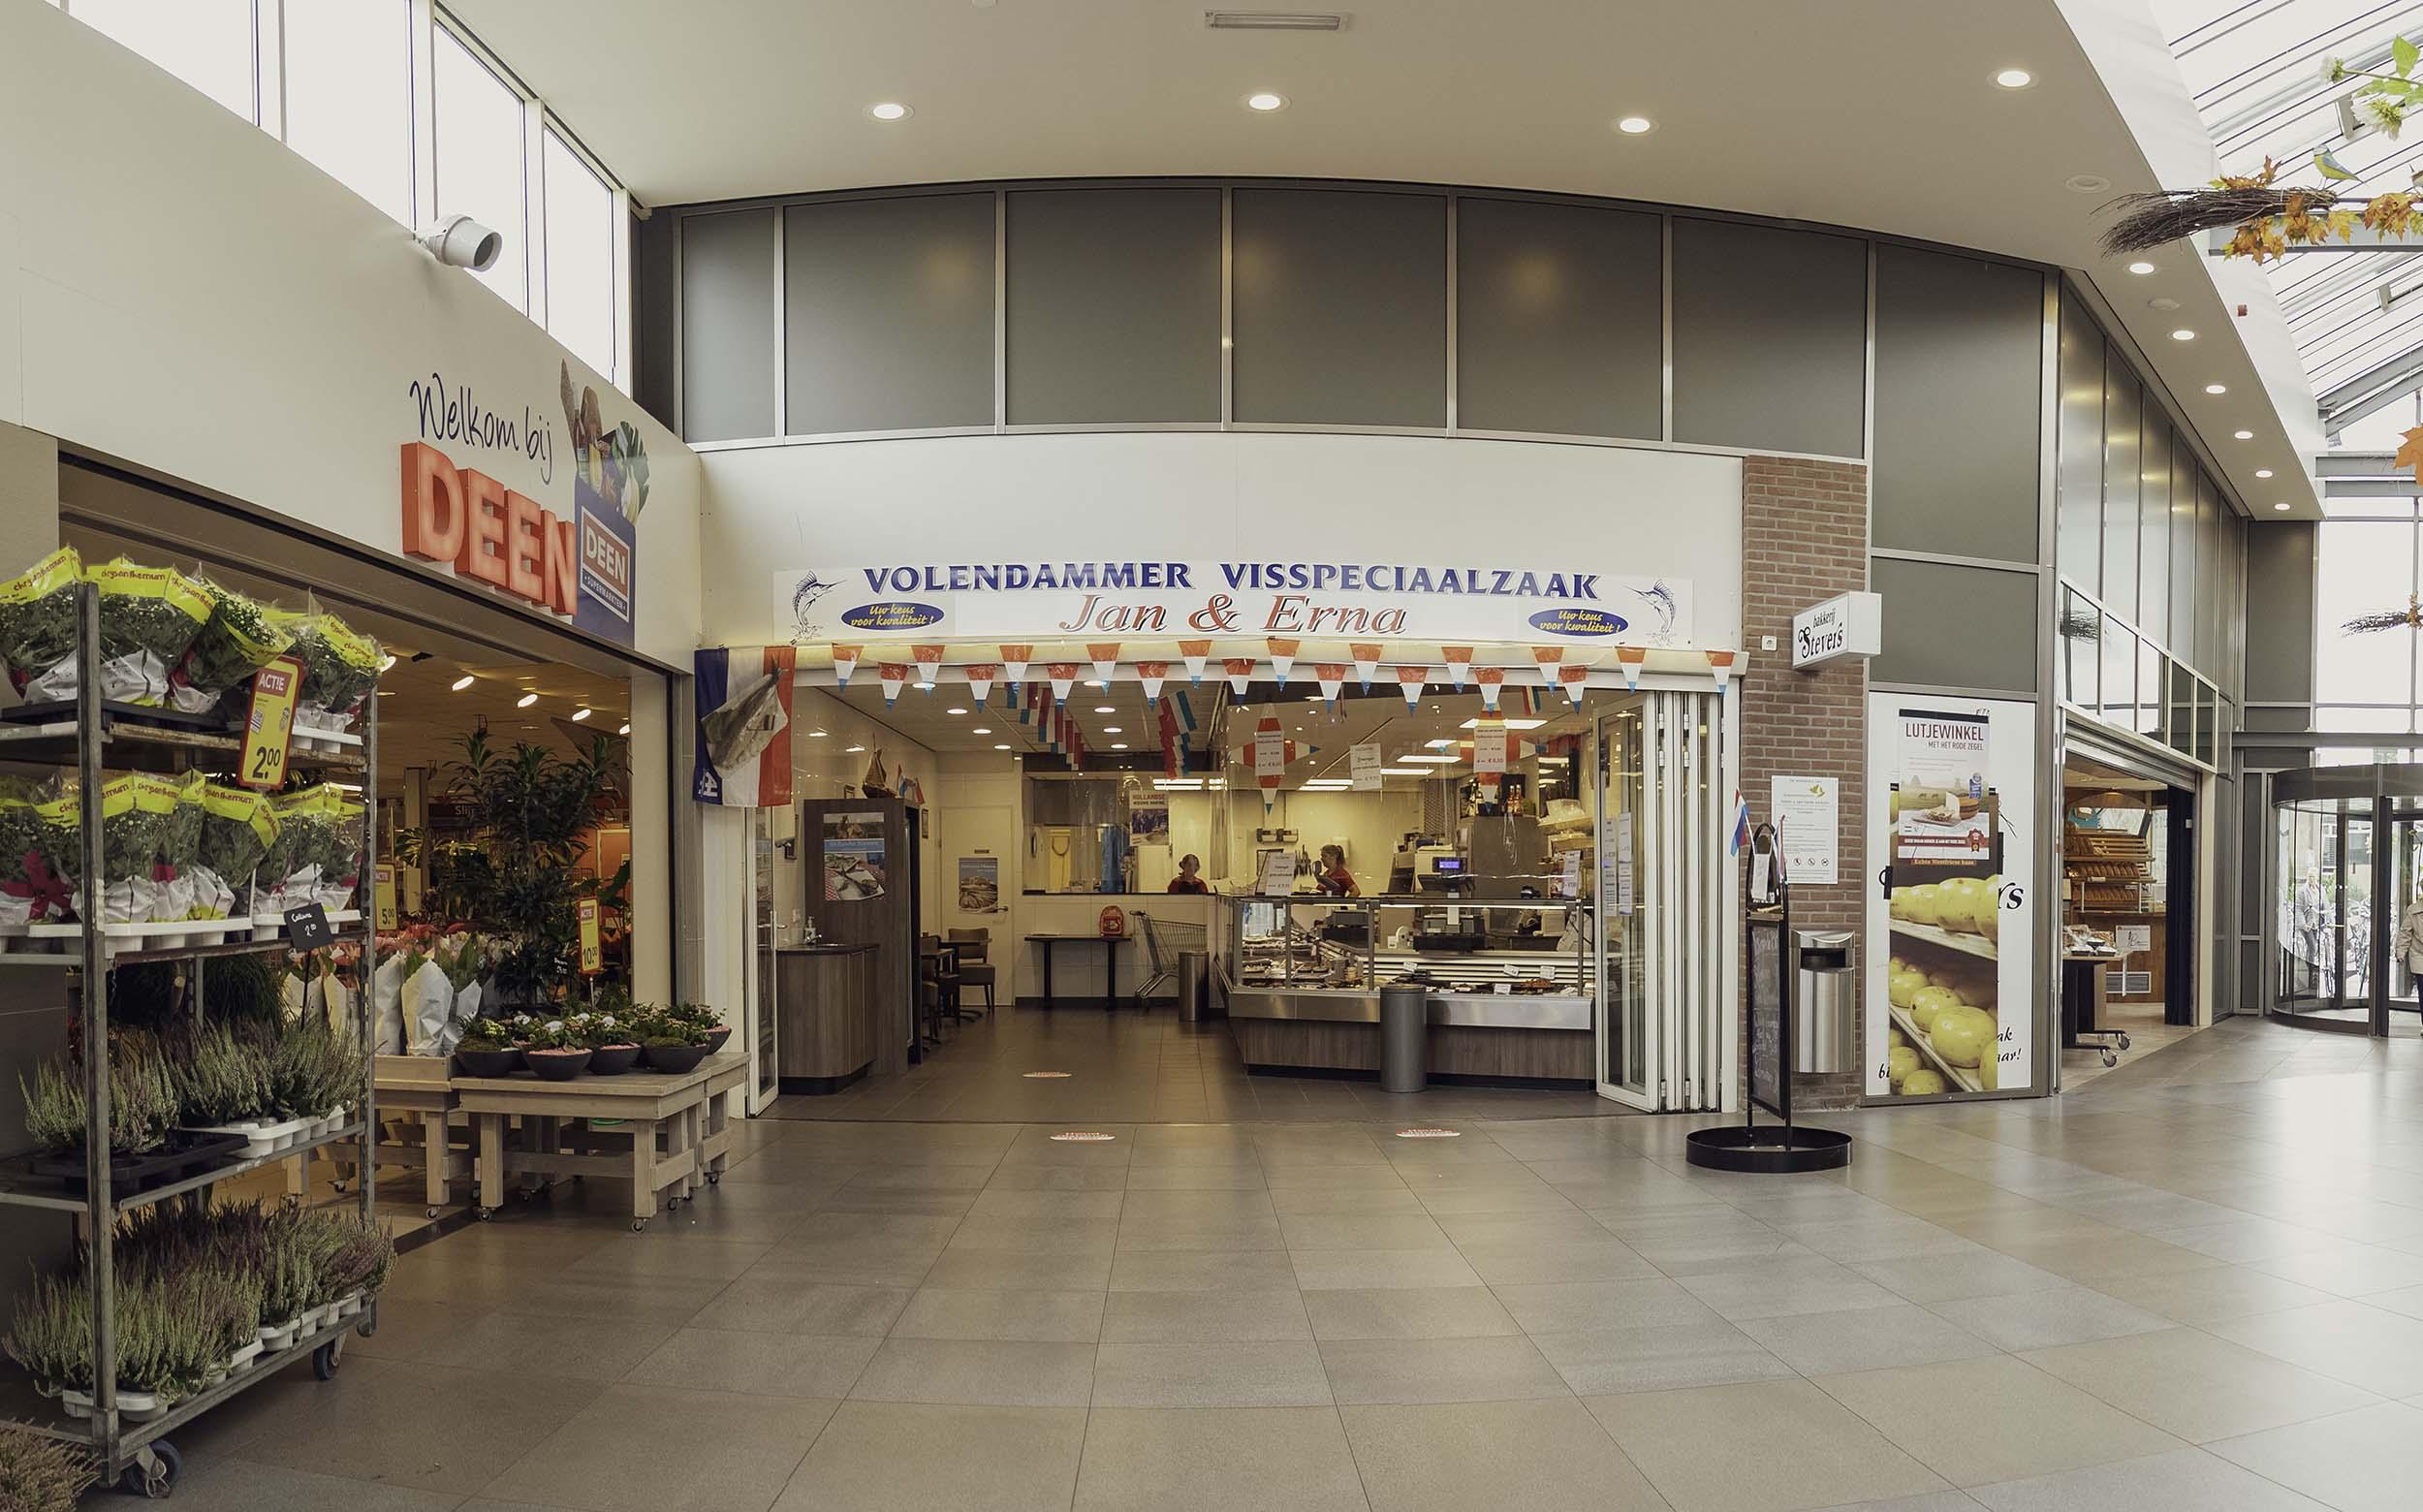 Visspeciaalzaak Jan Erna Winkelcentrum Koperwiekplein